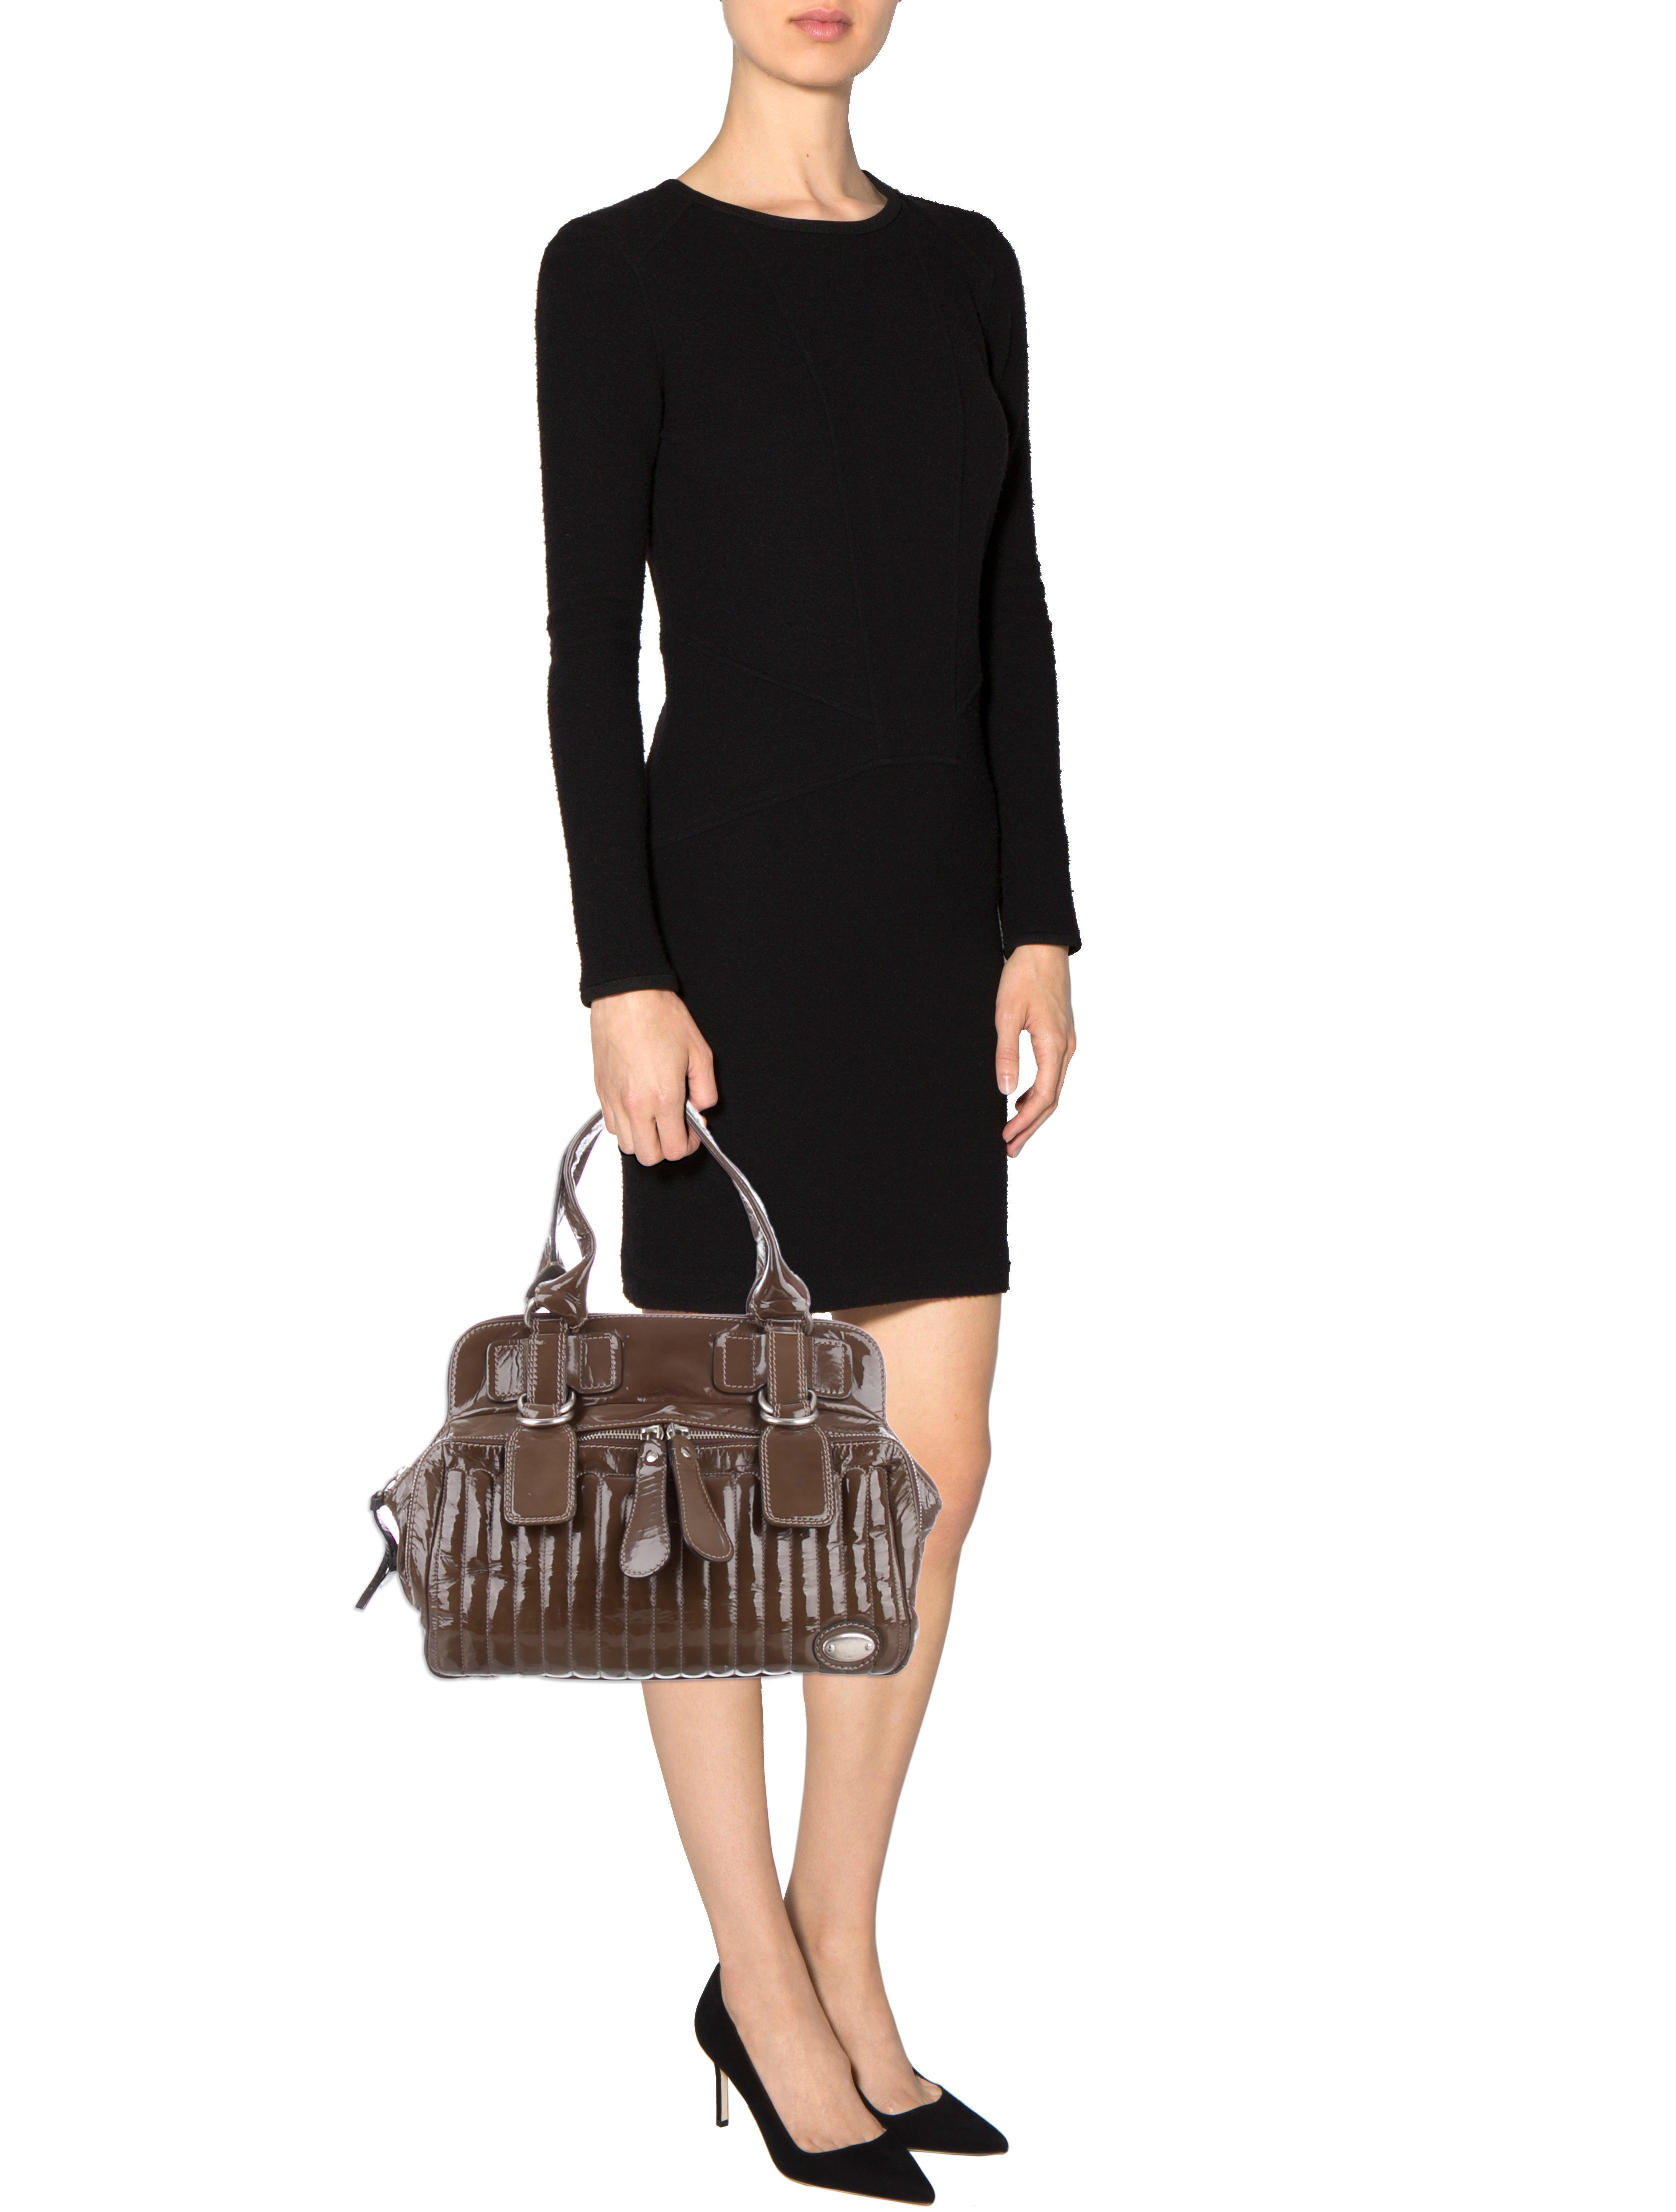 fake chloe bags - Chlo�� Patent Leather Bay Bag - Handbags - CHL37897 | The RealReal